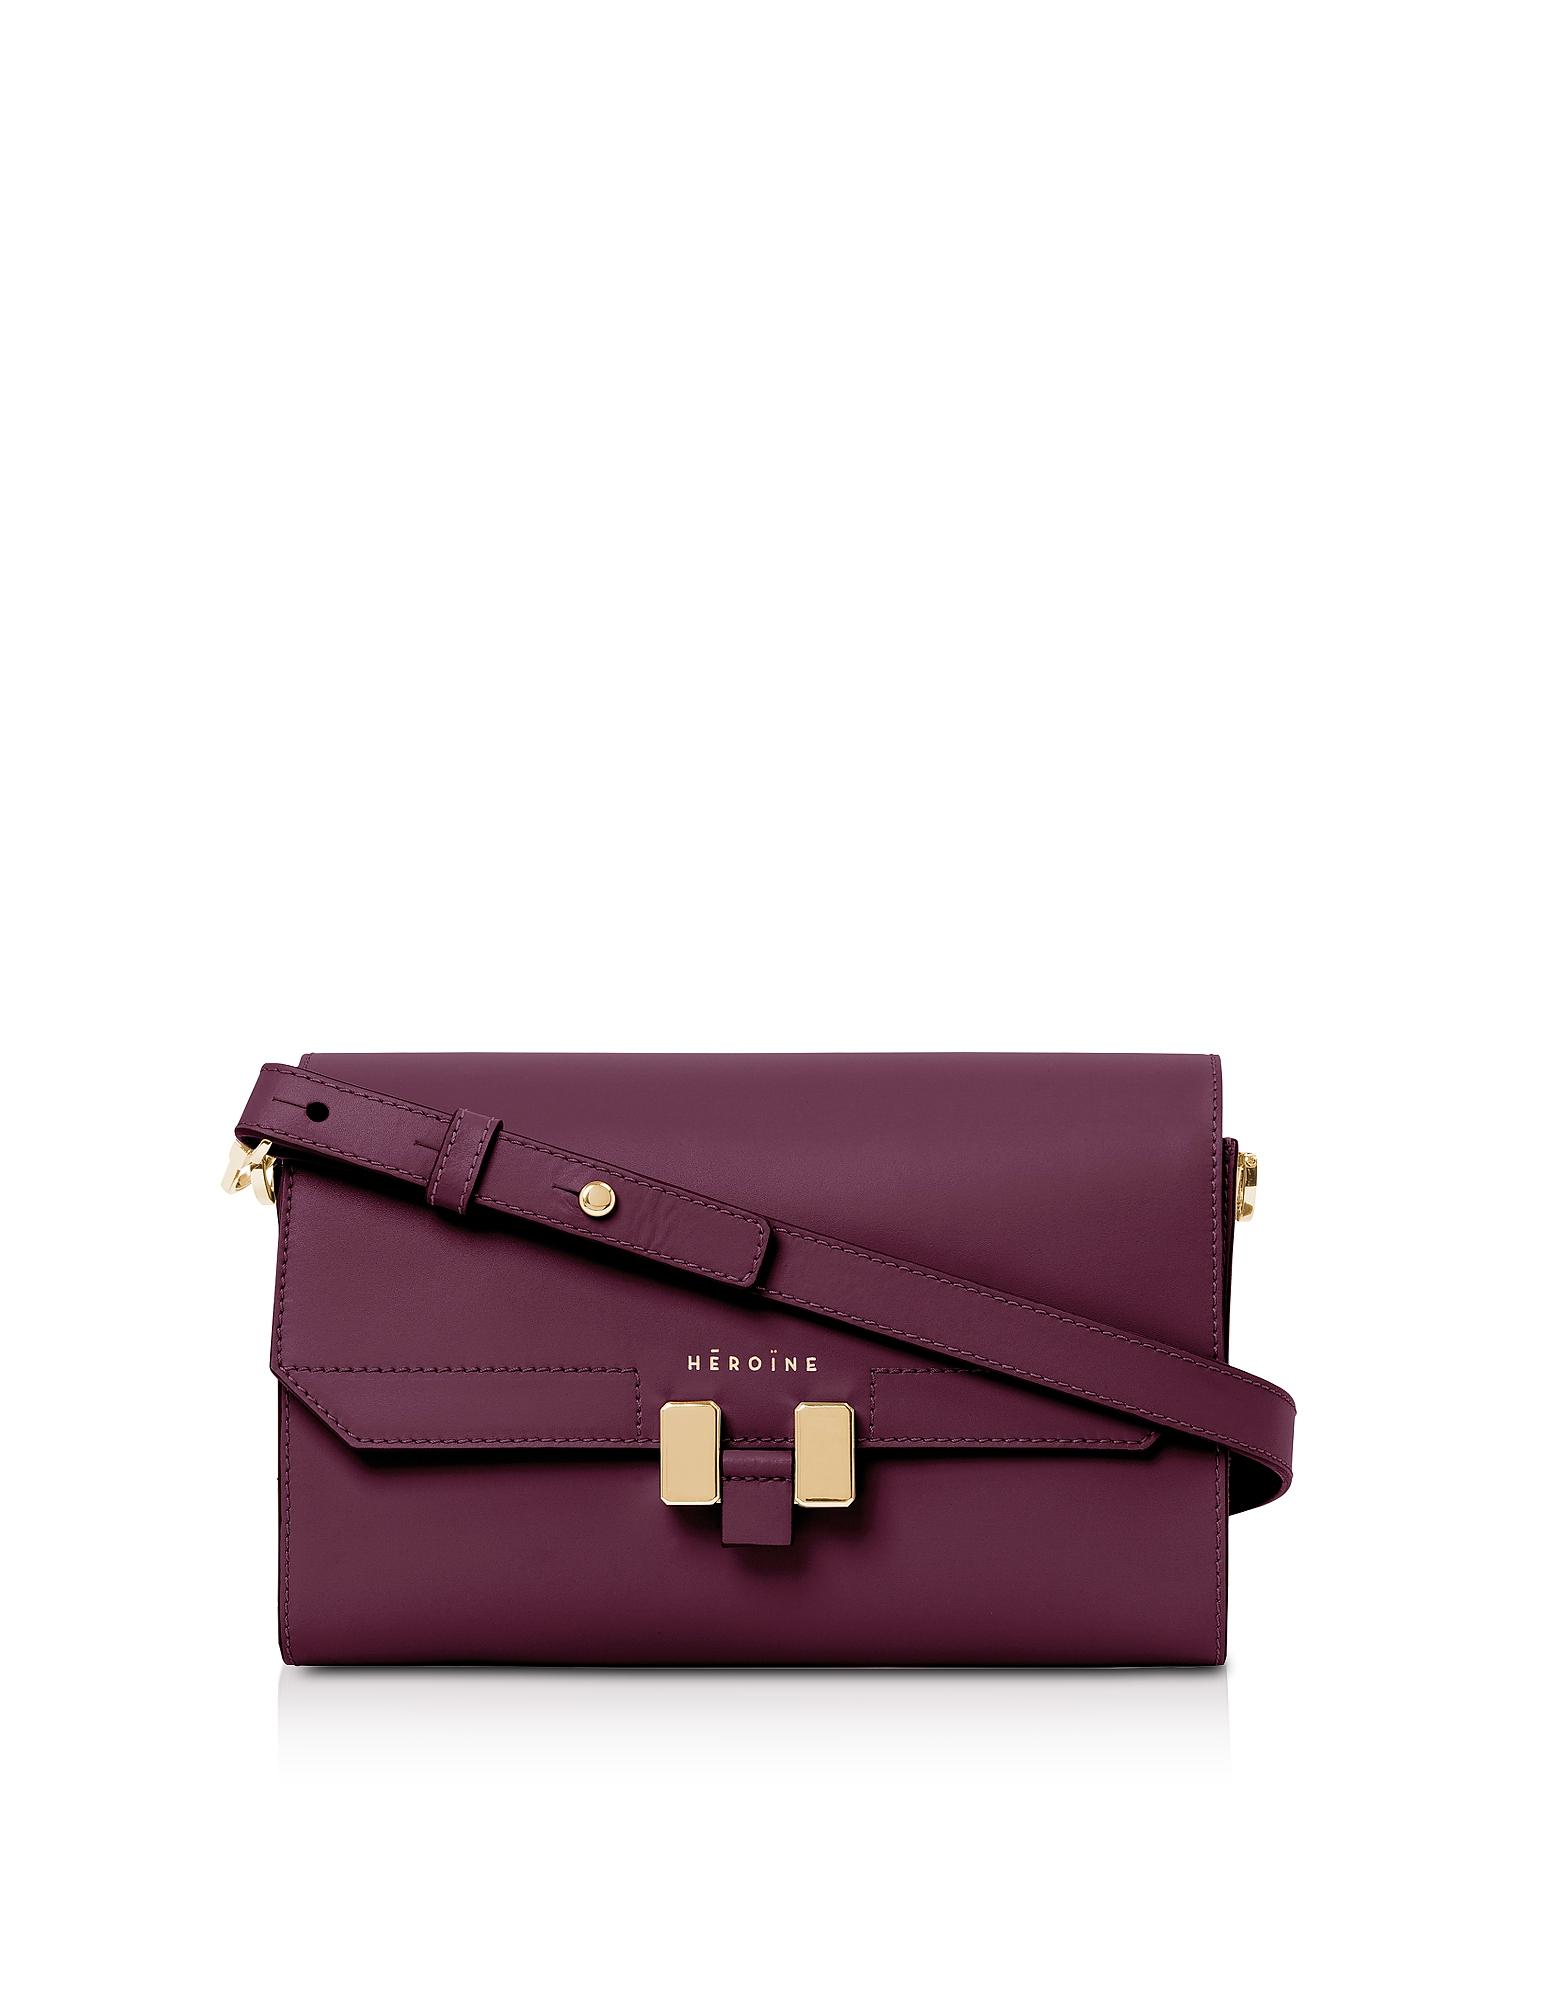 Maison Heroine Designer Handbags, Berry Leather Lilia Tablet Mini Shoulder Bag